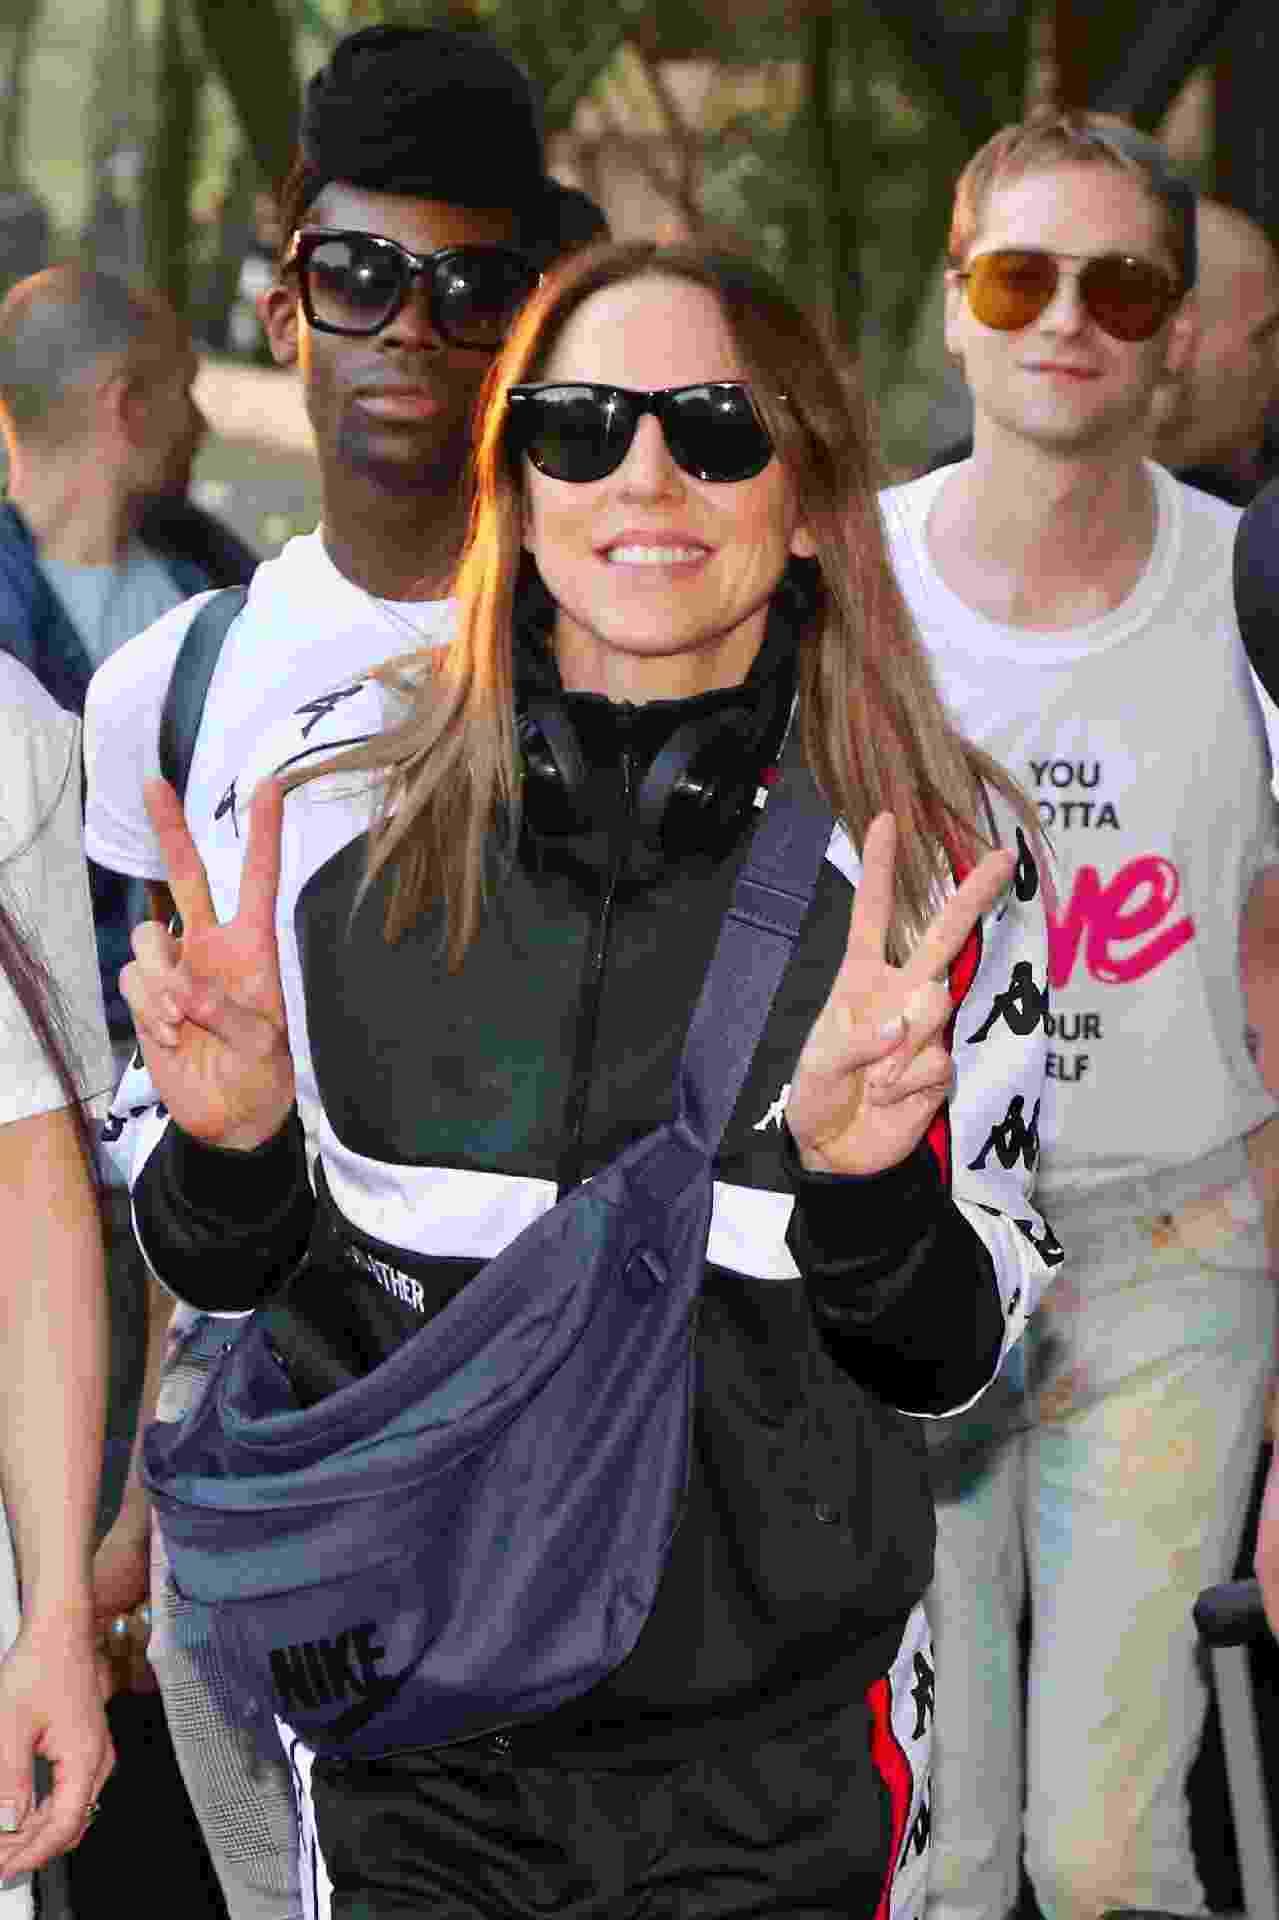 A Spice Girl, Melanie C, já está no Brasil onde participará da Parada do Orgulho LGBT - Manuela Scarpa/Brazil News